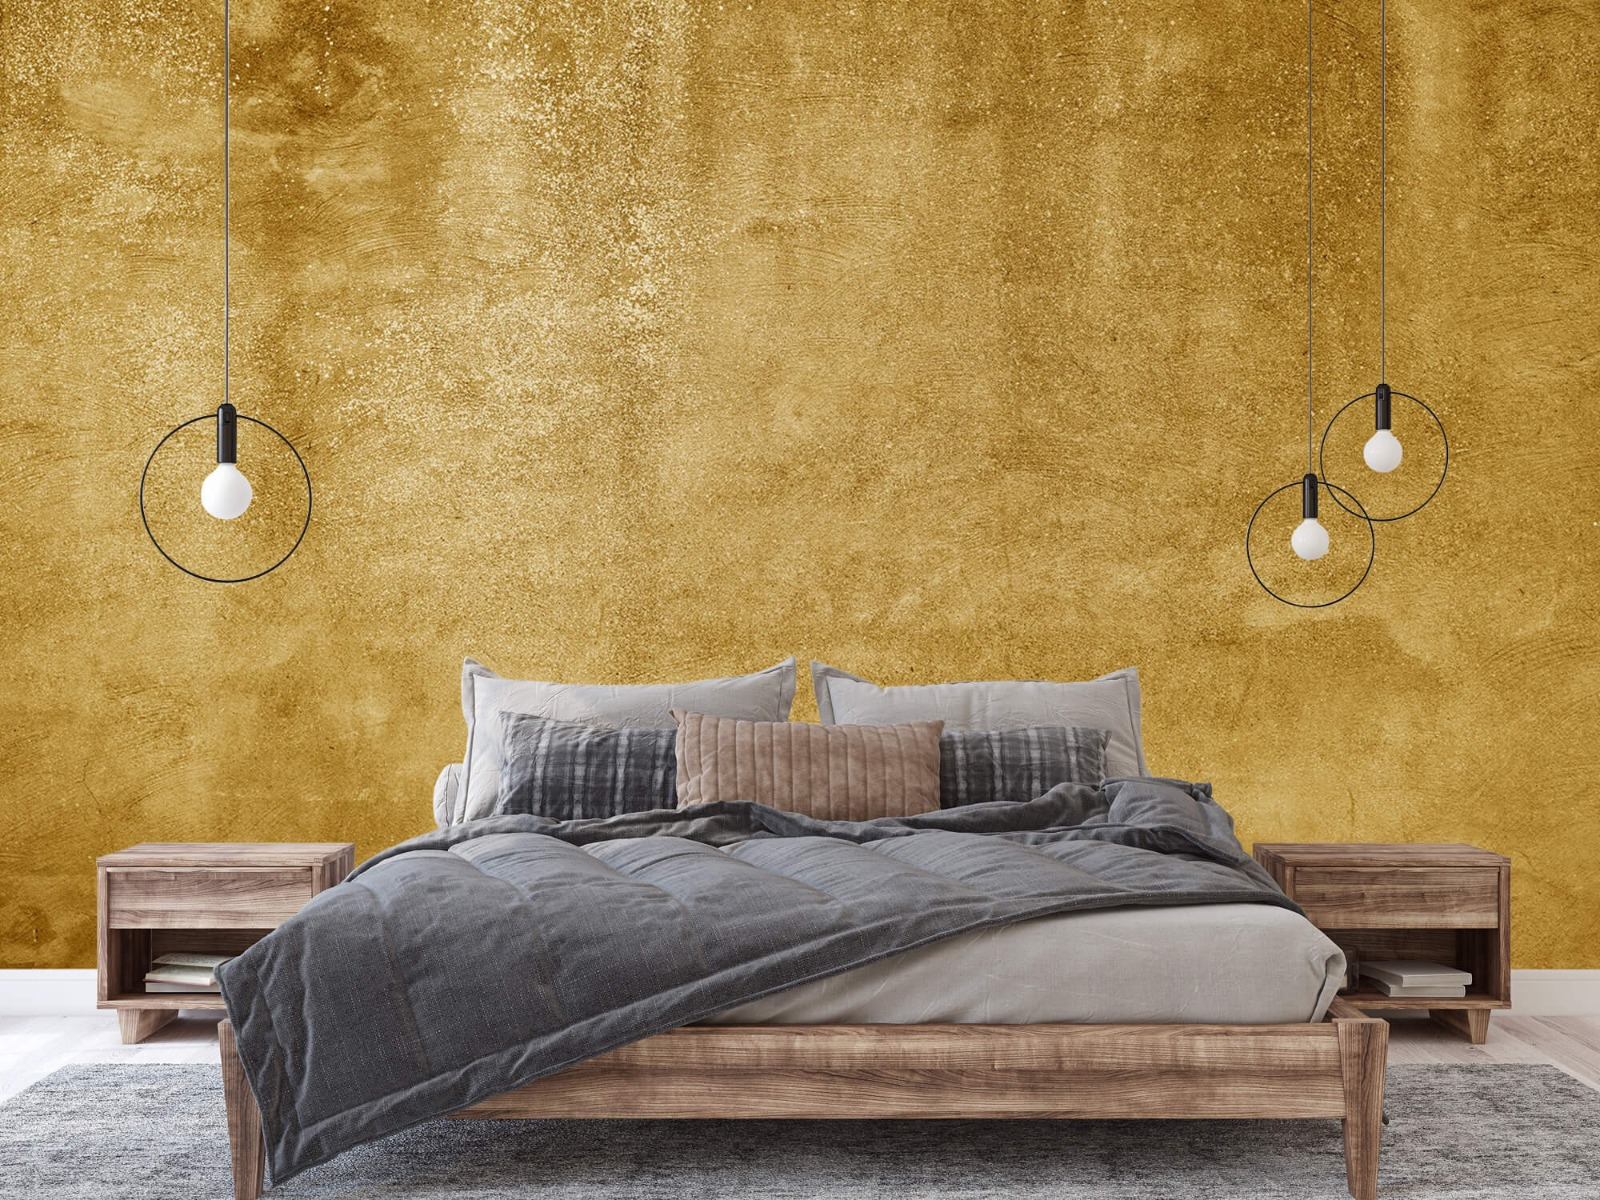 Betonlook behang - Oker geel beton - Woonkamer 3